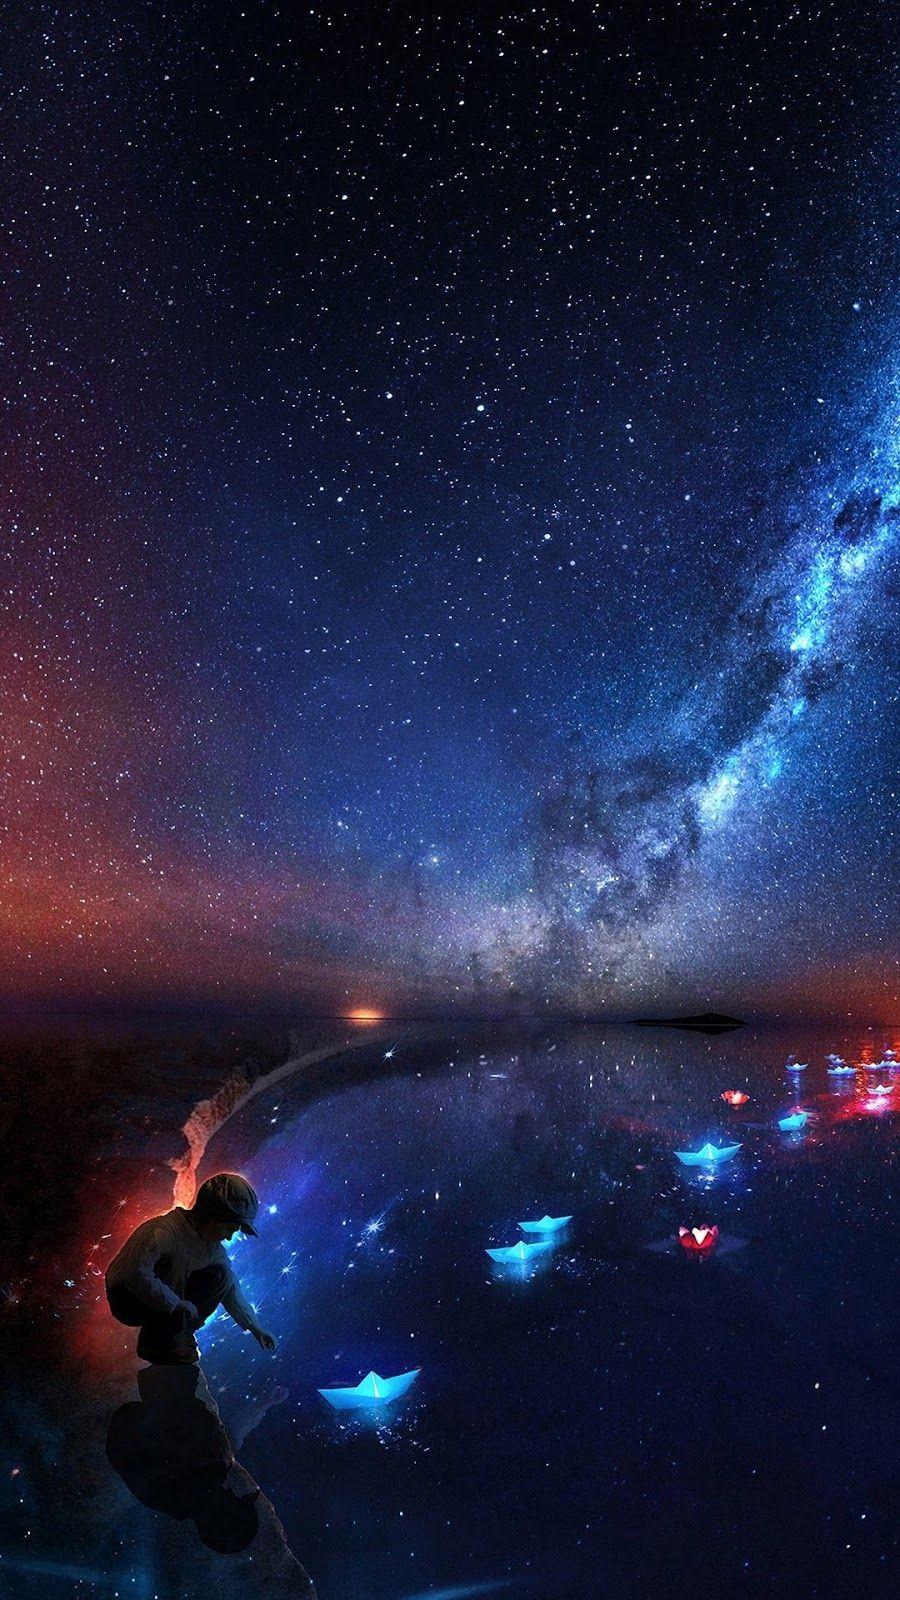 Starry Night Starry Night Wallpaper Galaxy Wallpaper Fantasy Landscape